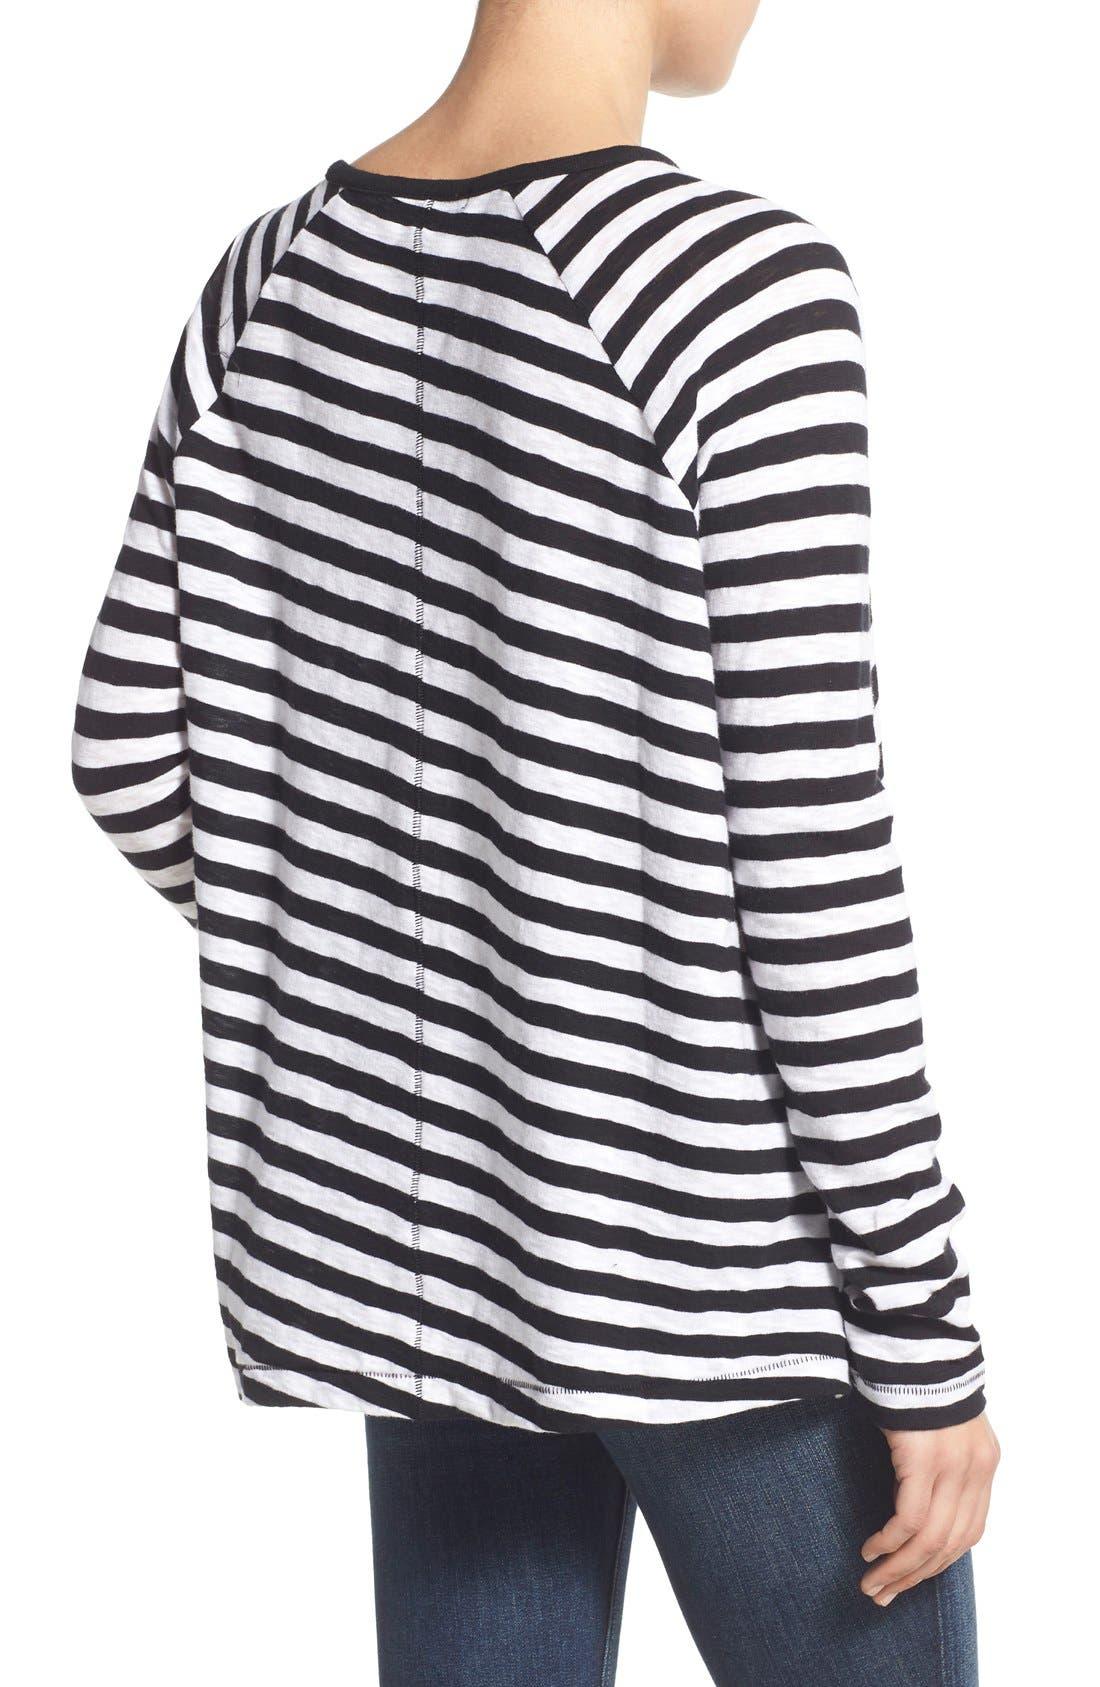 Alternate Image 2  - rag & bone/JEAN 'Camden' Stripe Long Sleeve Tee